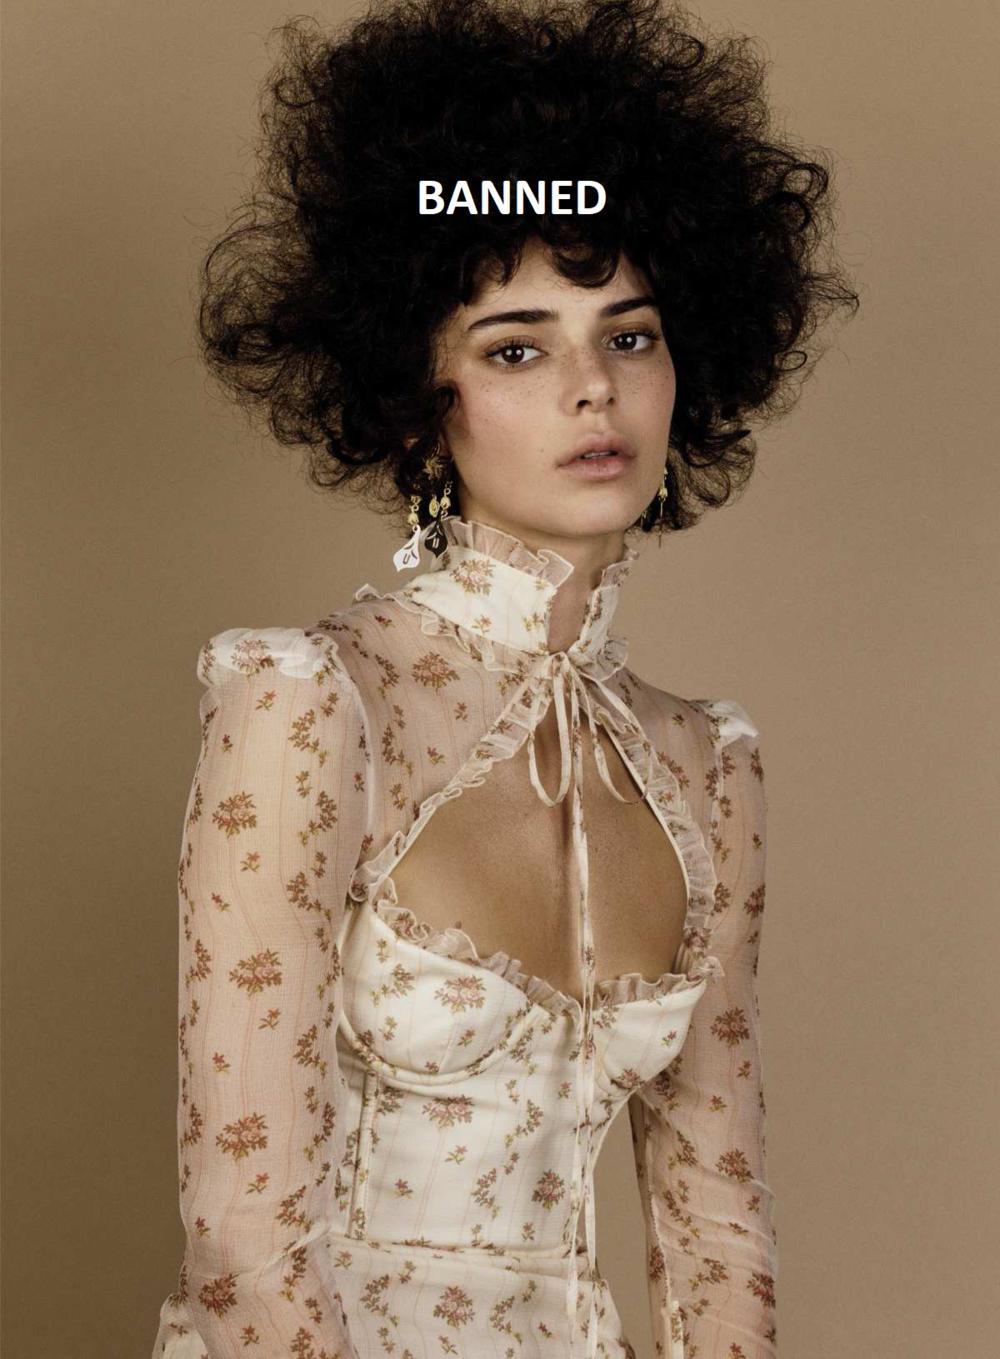 Imaan+Hammam+Kendall+Jenner+Vogue+US+Nov+2018+(2) Banned.png